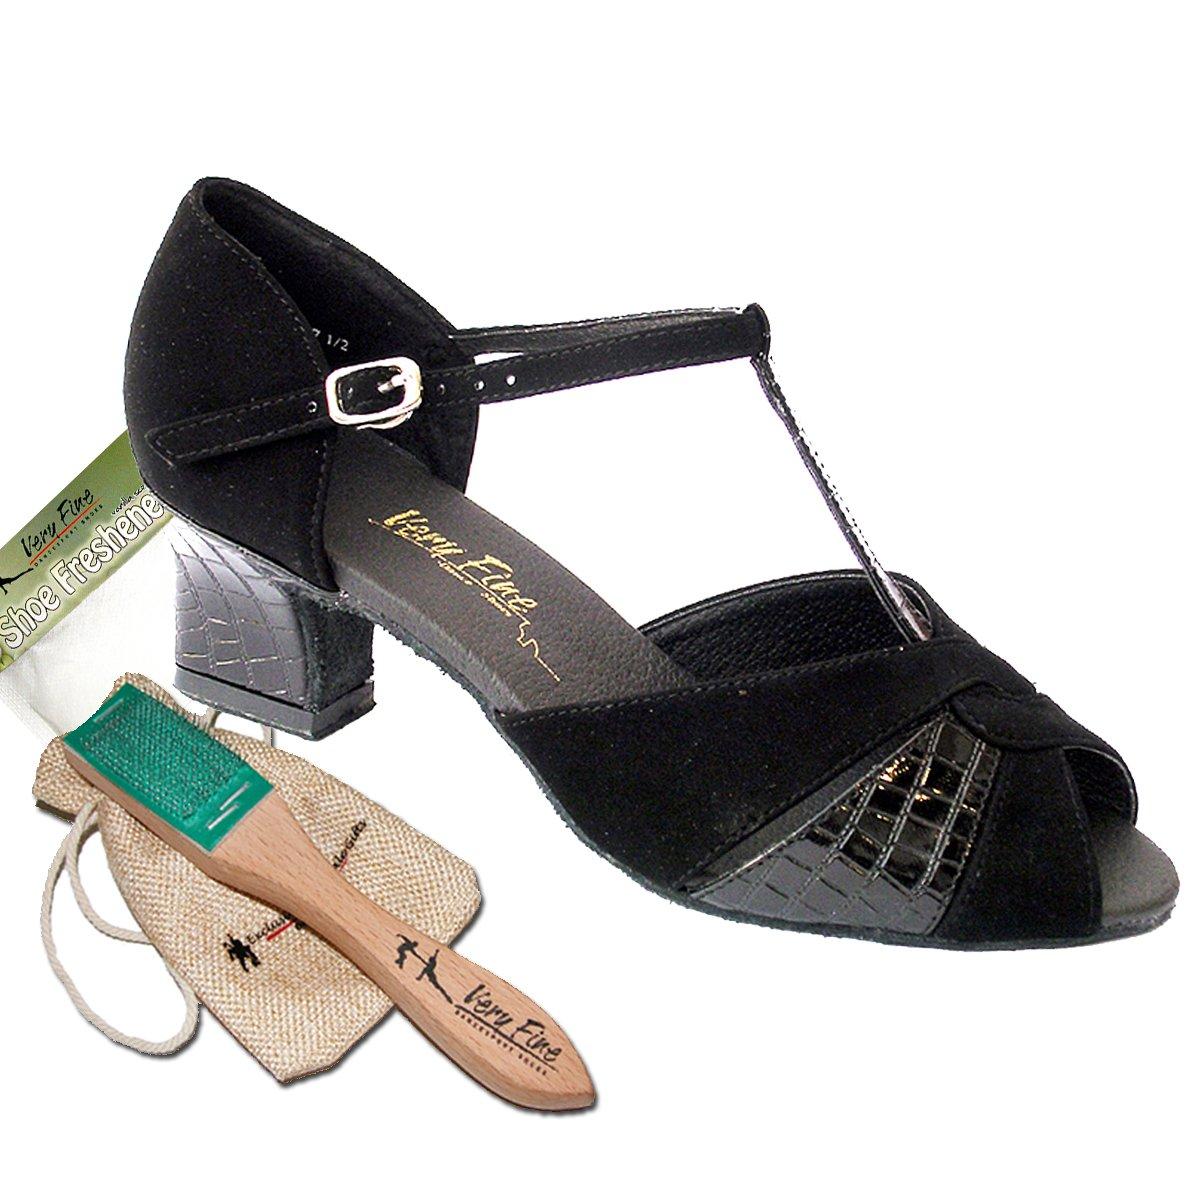 Women's Ballroom Dance Shoes Salsa Latin Practice Dance Shoes Black Nubuck 6006EB Comfortable - Very Fine 2'' Heel 8.5 M US [Bundle of 5]